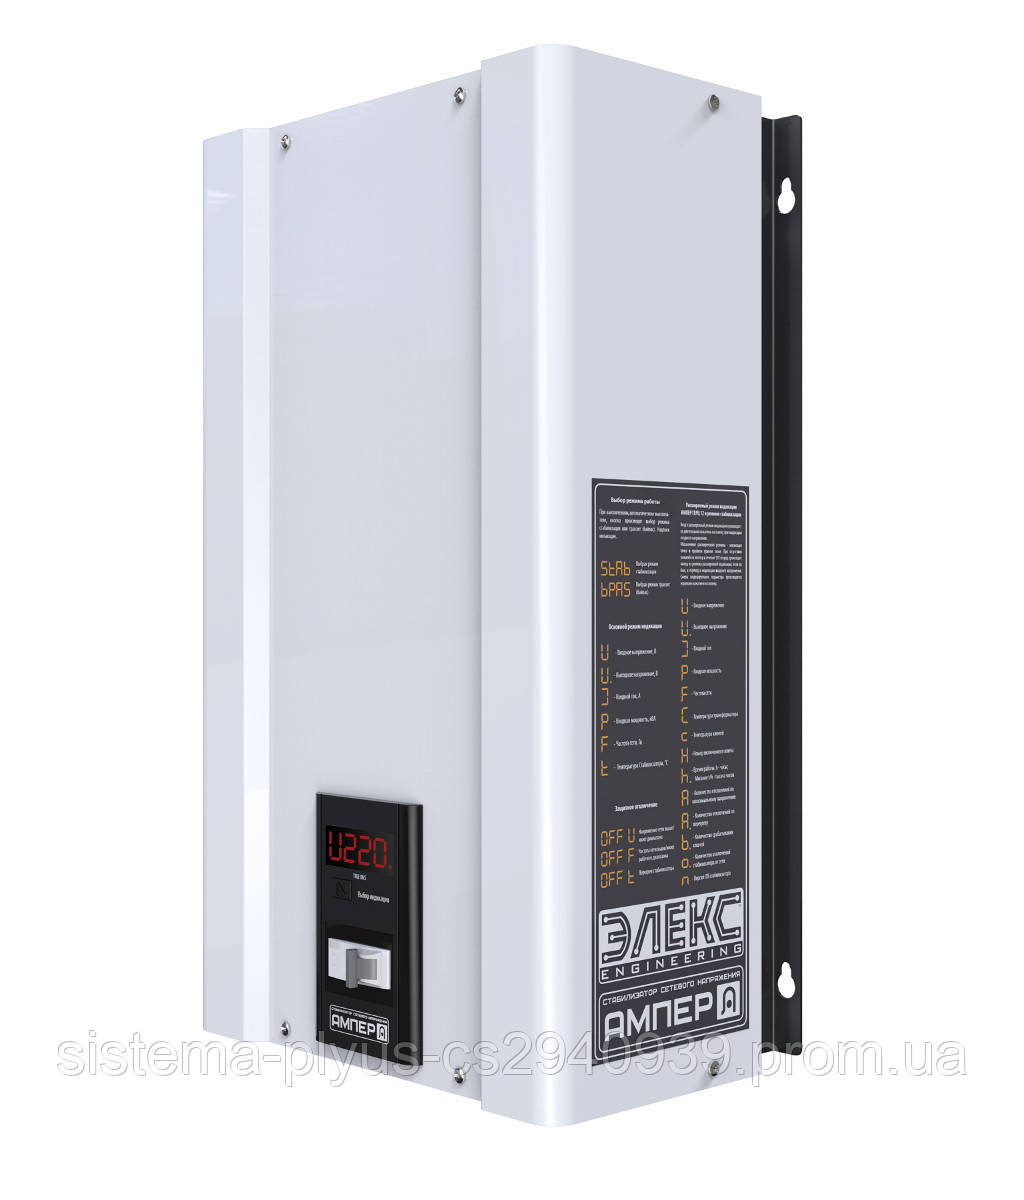 Стабилизатор напряжения Элекс Engineering Ампер-Т У 16-1/40 v2.0